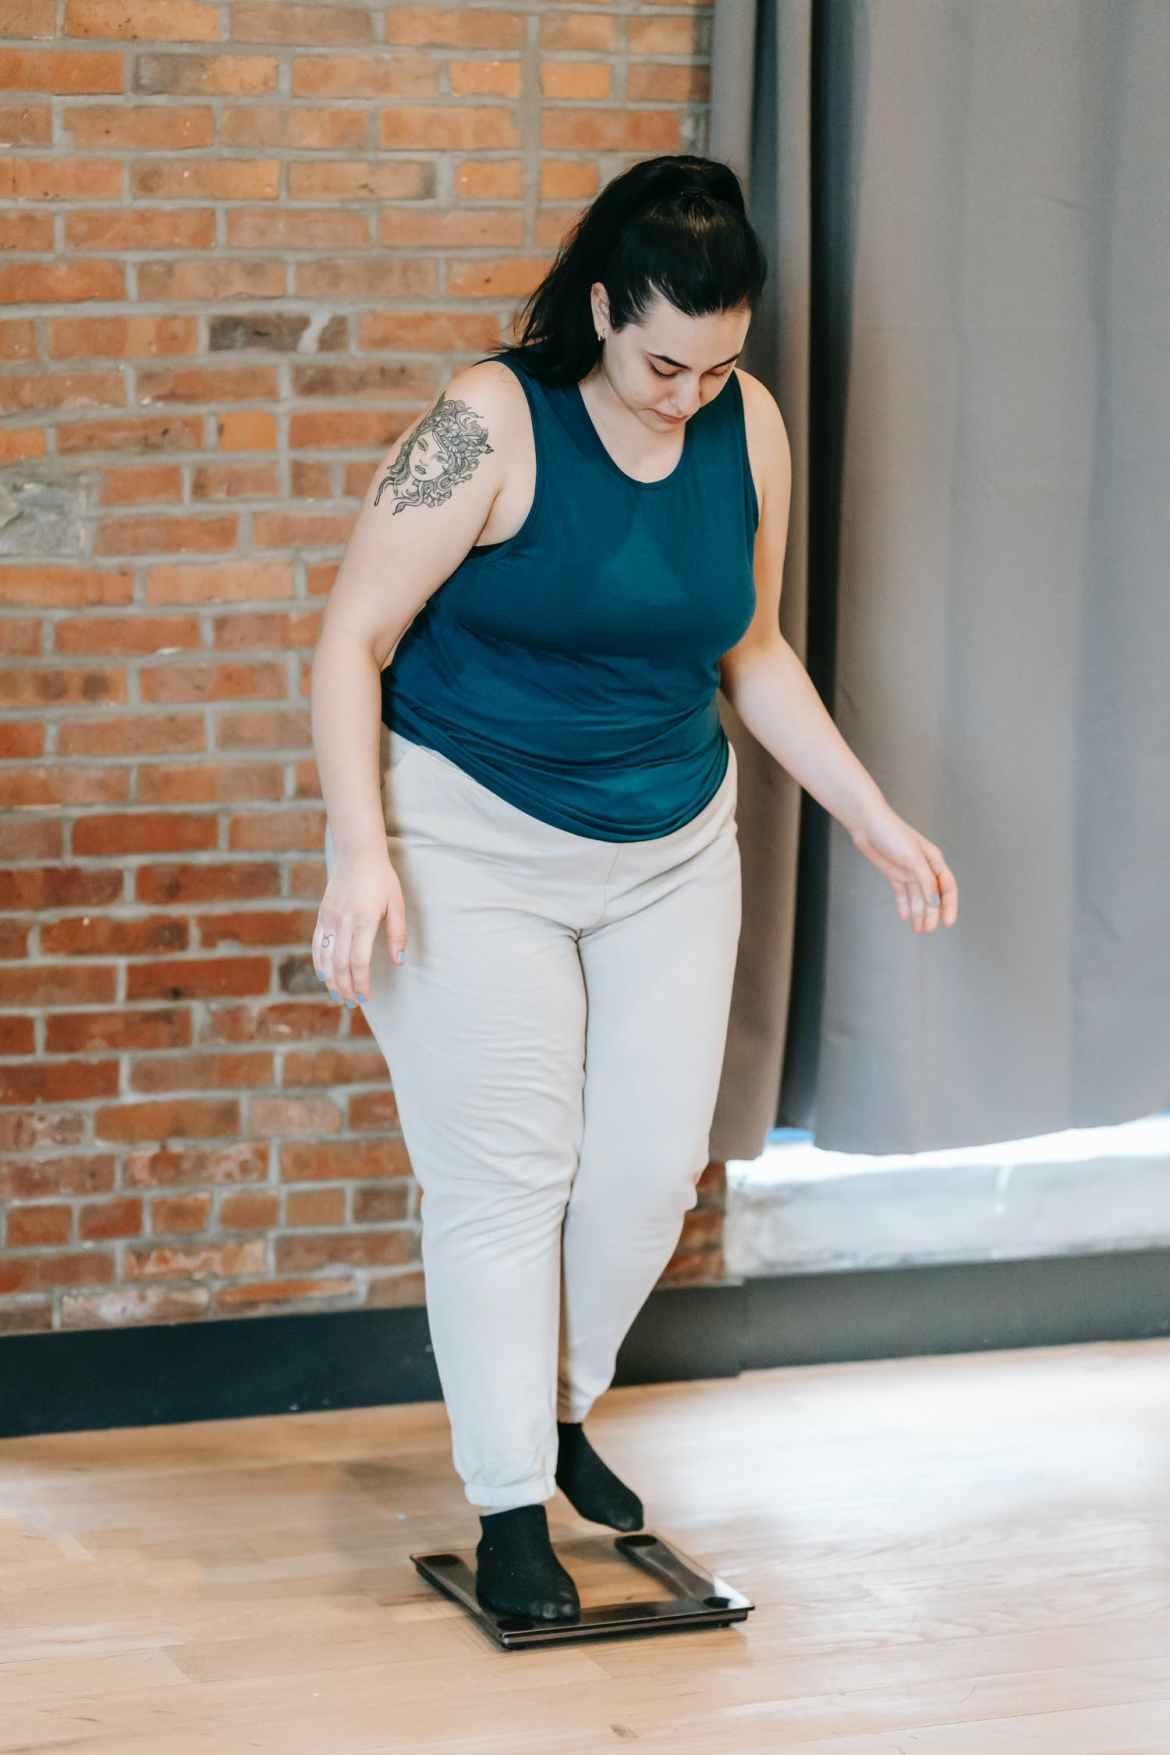 Weight Loss Surgery Benefits More Than Weight Loss